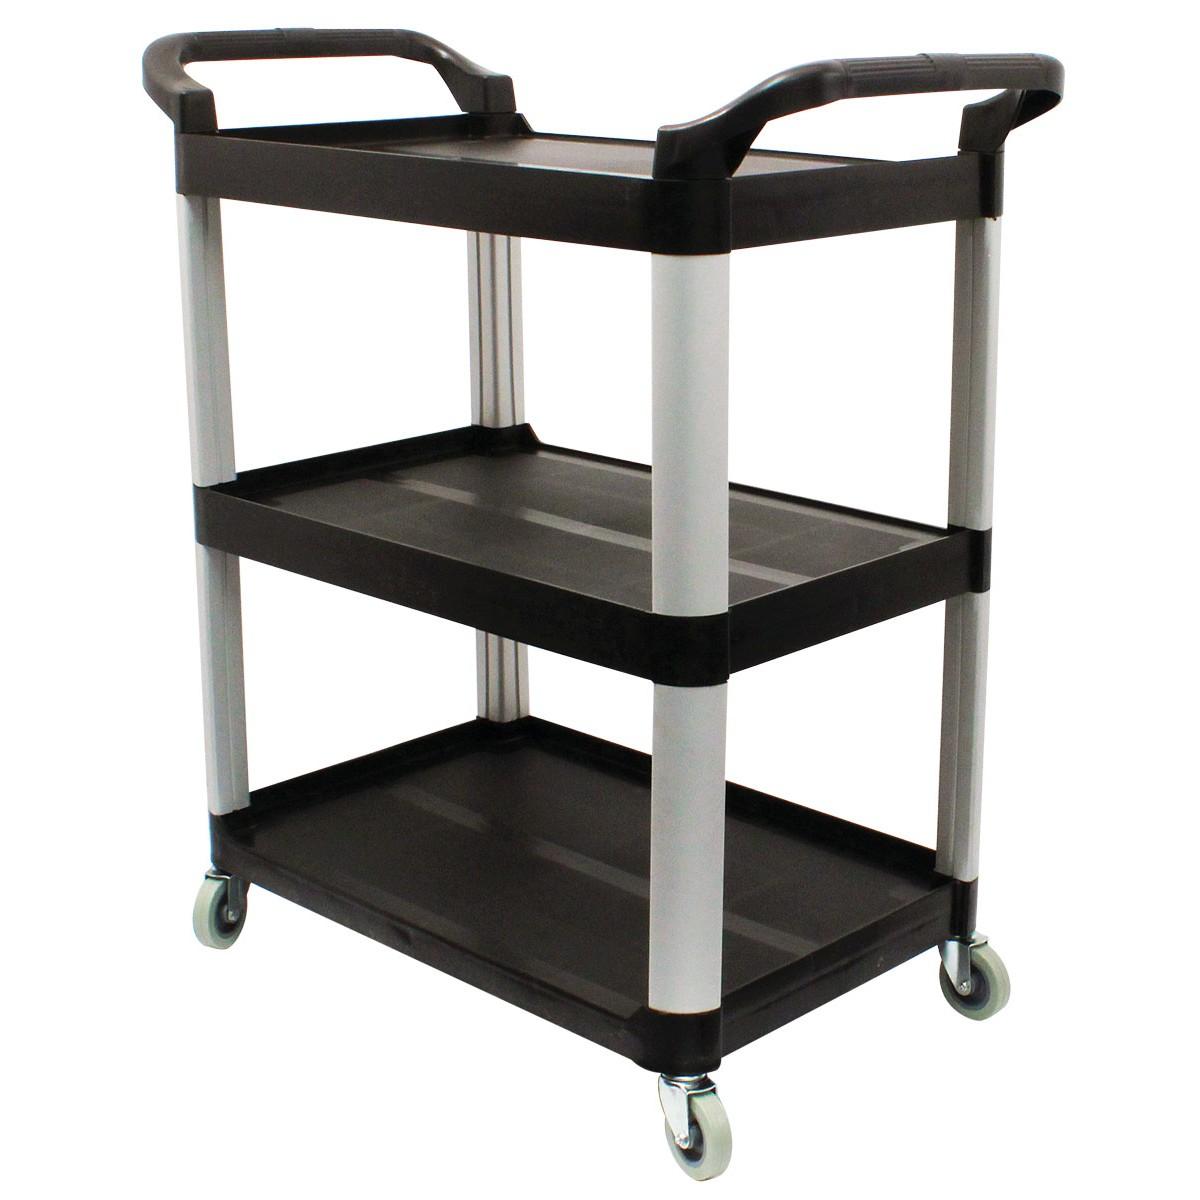 chariot de service 3 tablettes noir. Black Bedroom Furniture Sets. Home Design Ideas